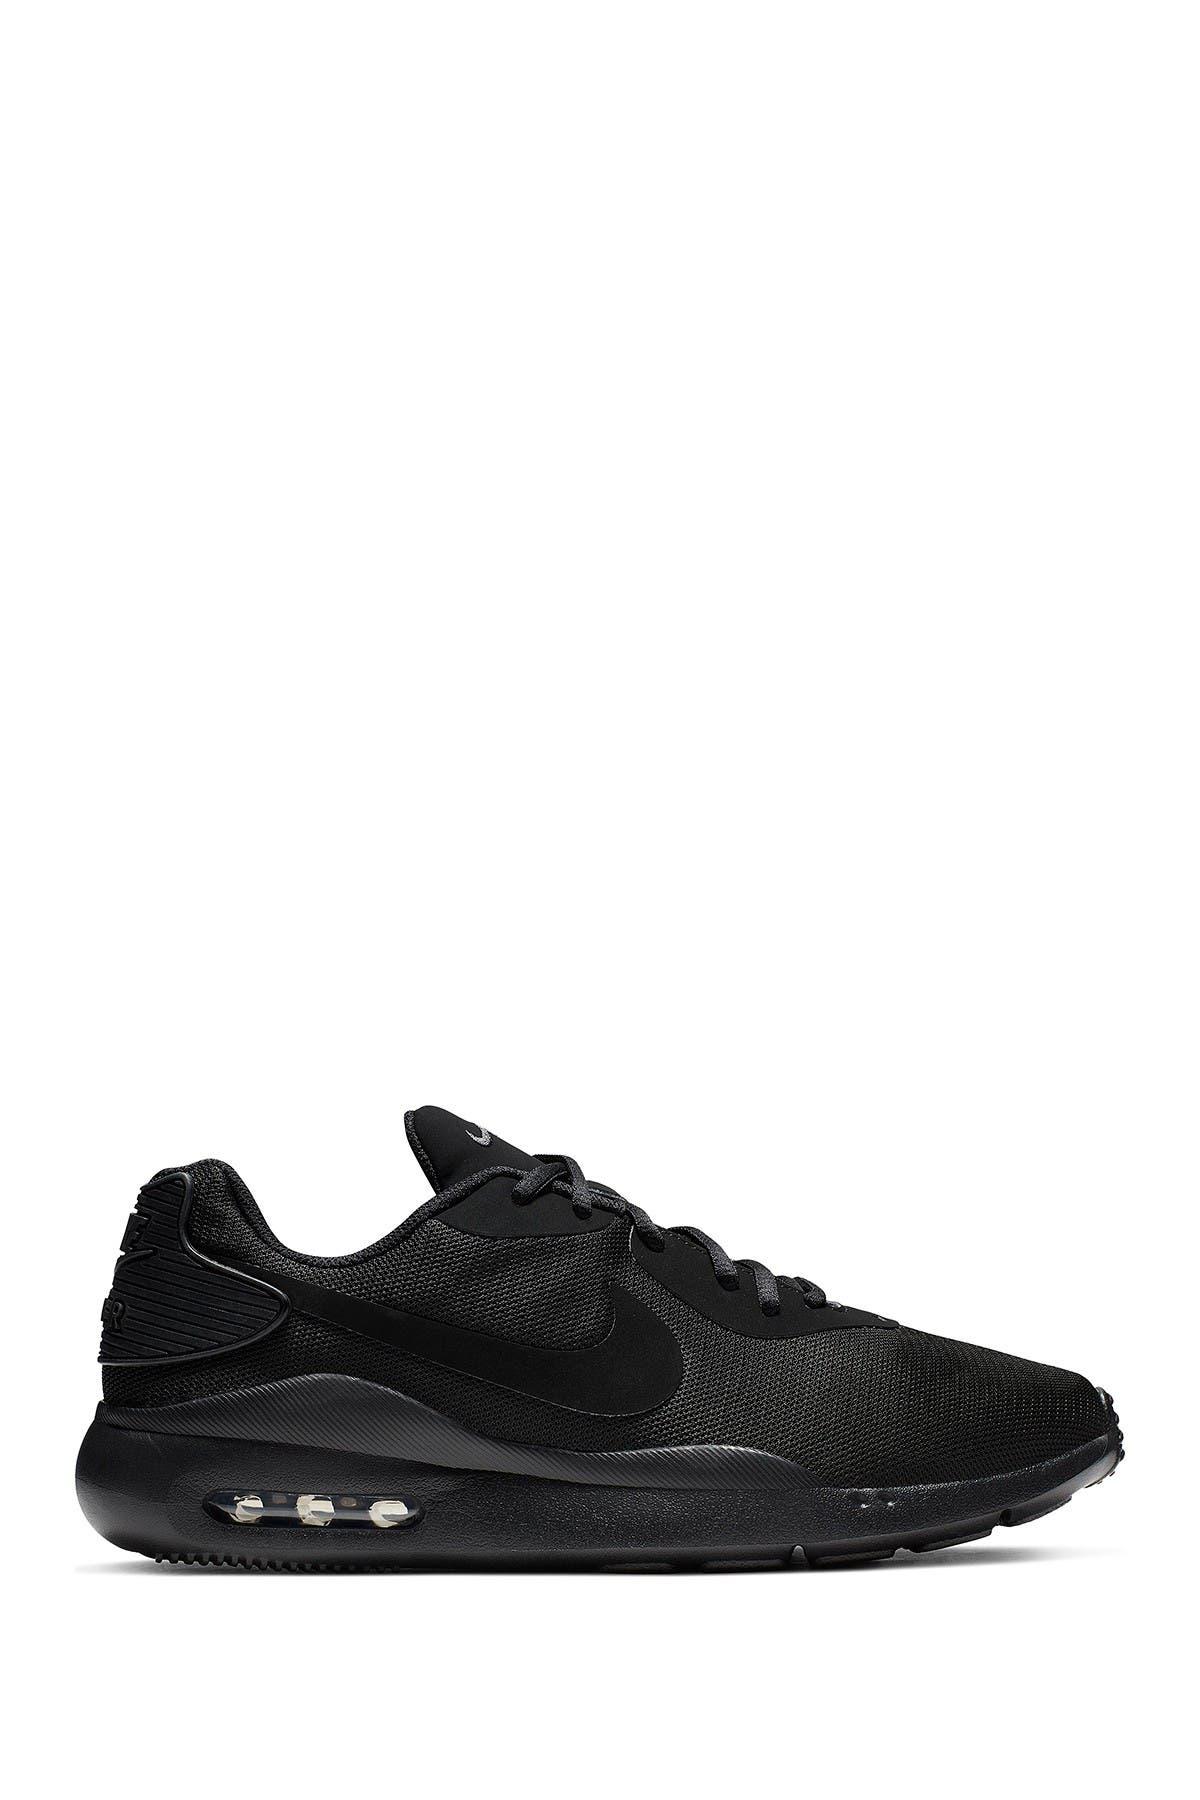 Nike | Air Max Oketo Sneaker | HauteLook